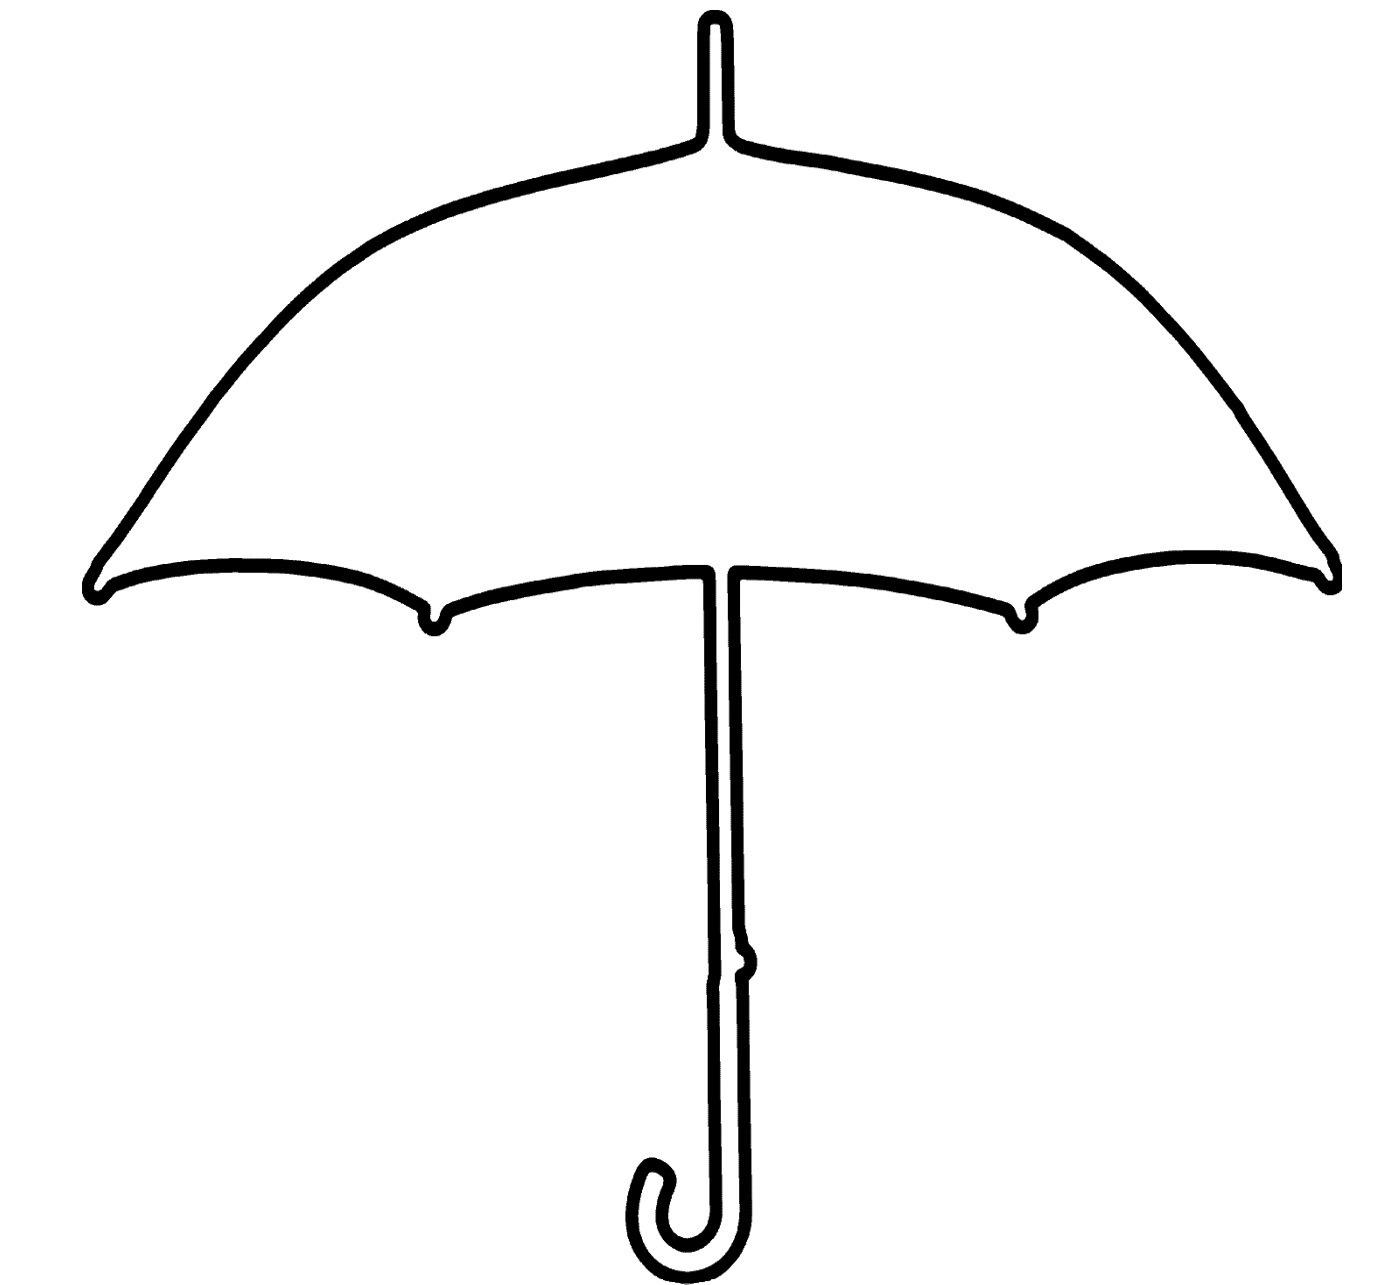 1397x1285 Umbrella Black And White Photos Of Umbrella Outline Clip Art